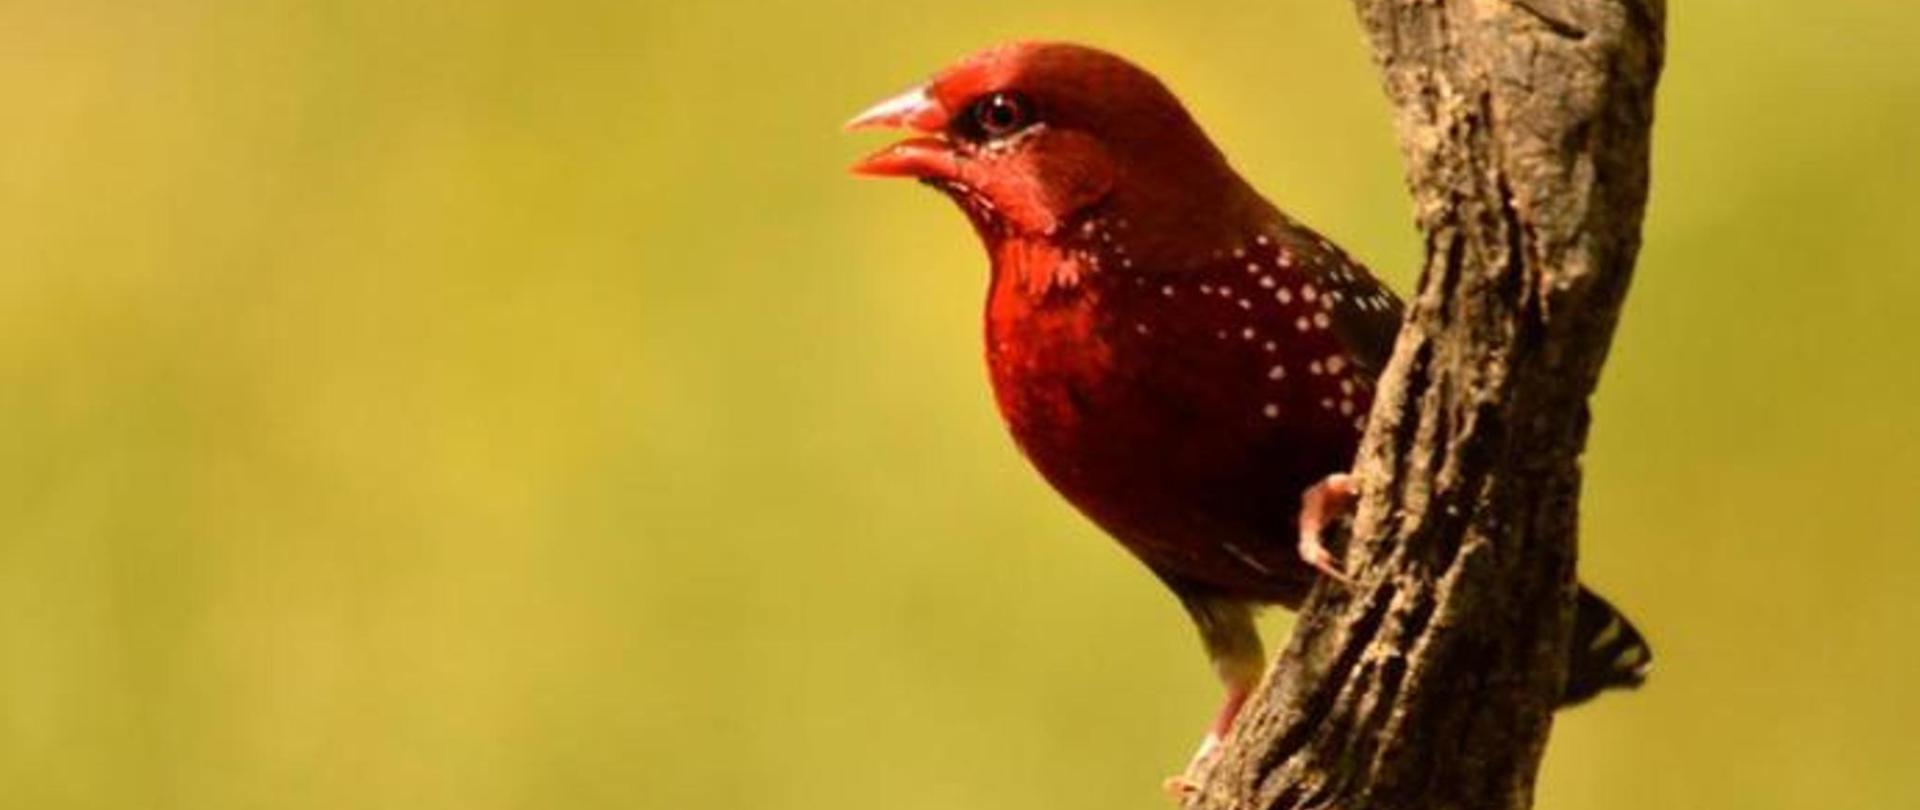 bengali.rojo-birdwatching-casarurallazafrilla-jerezdeloscaballeros.jpg